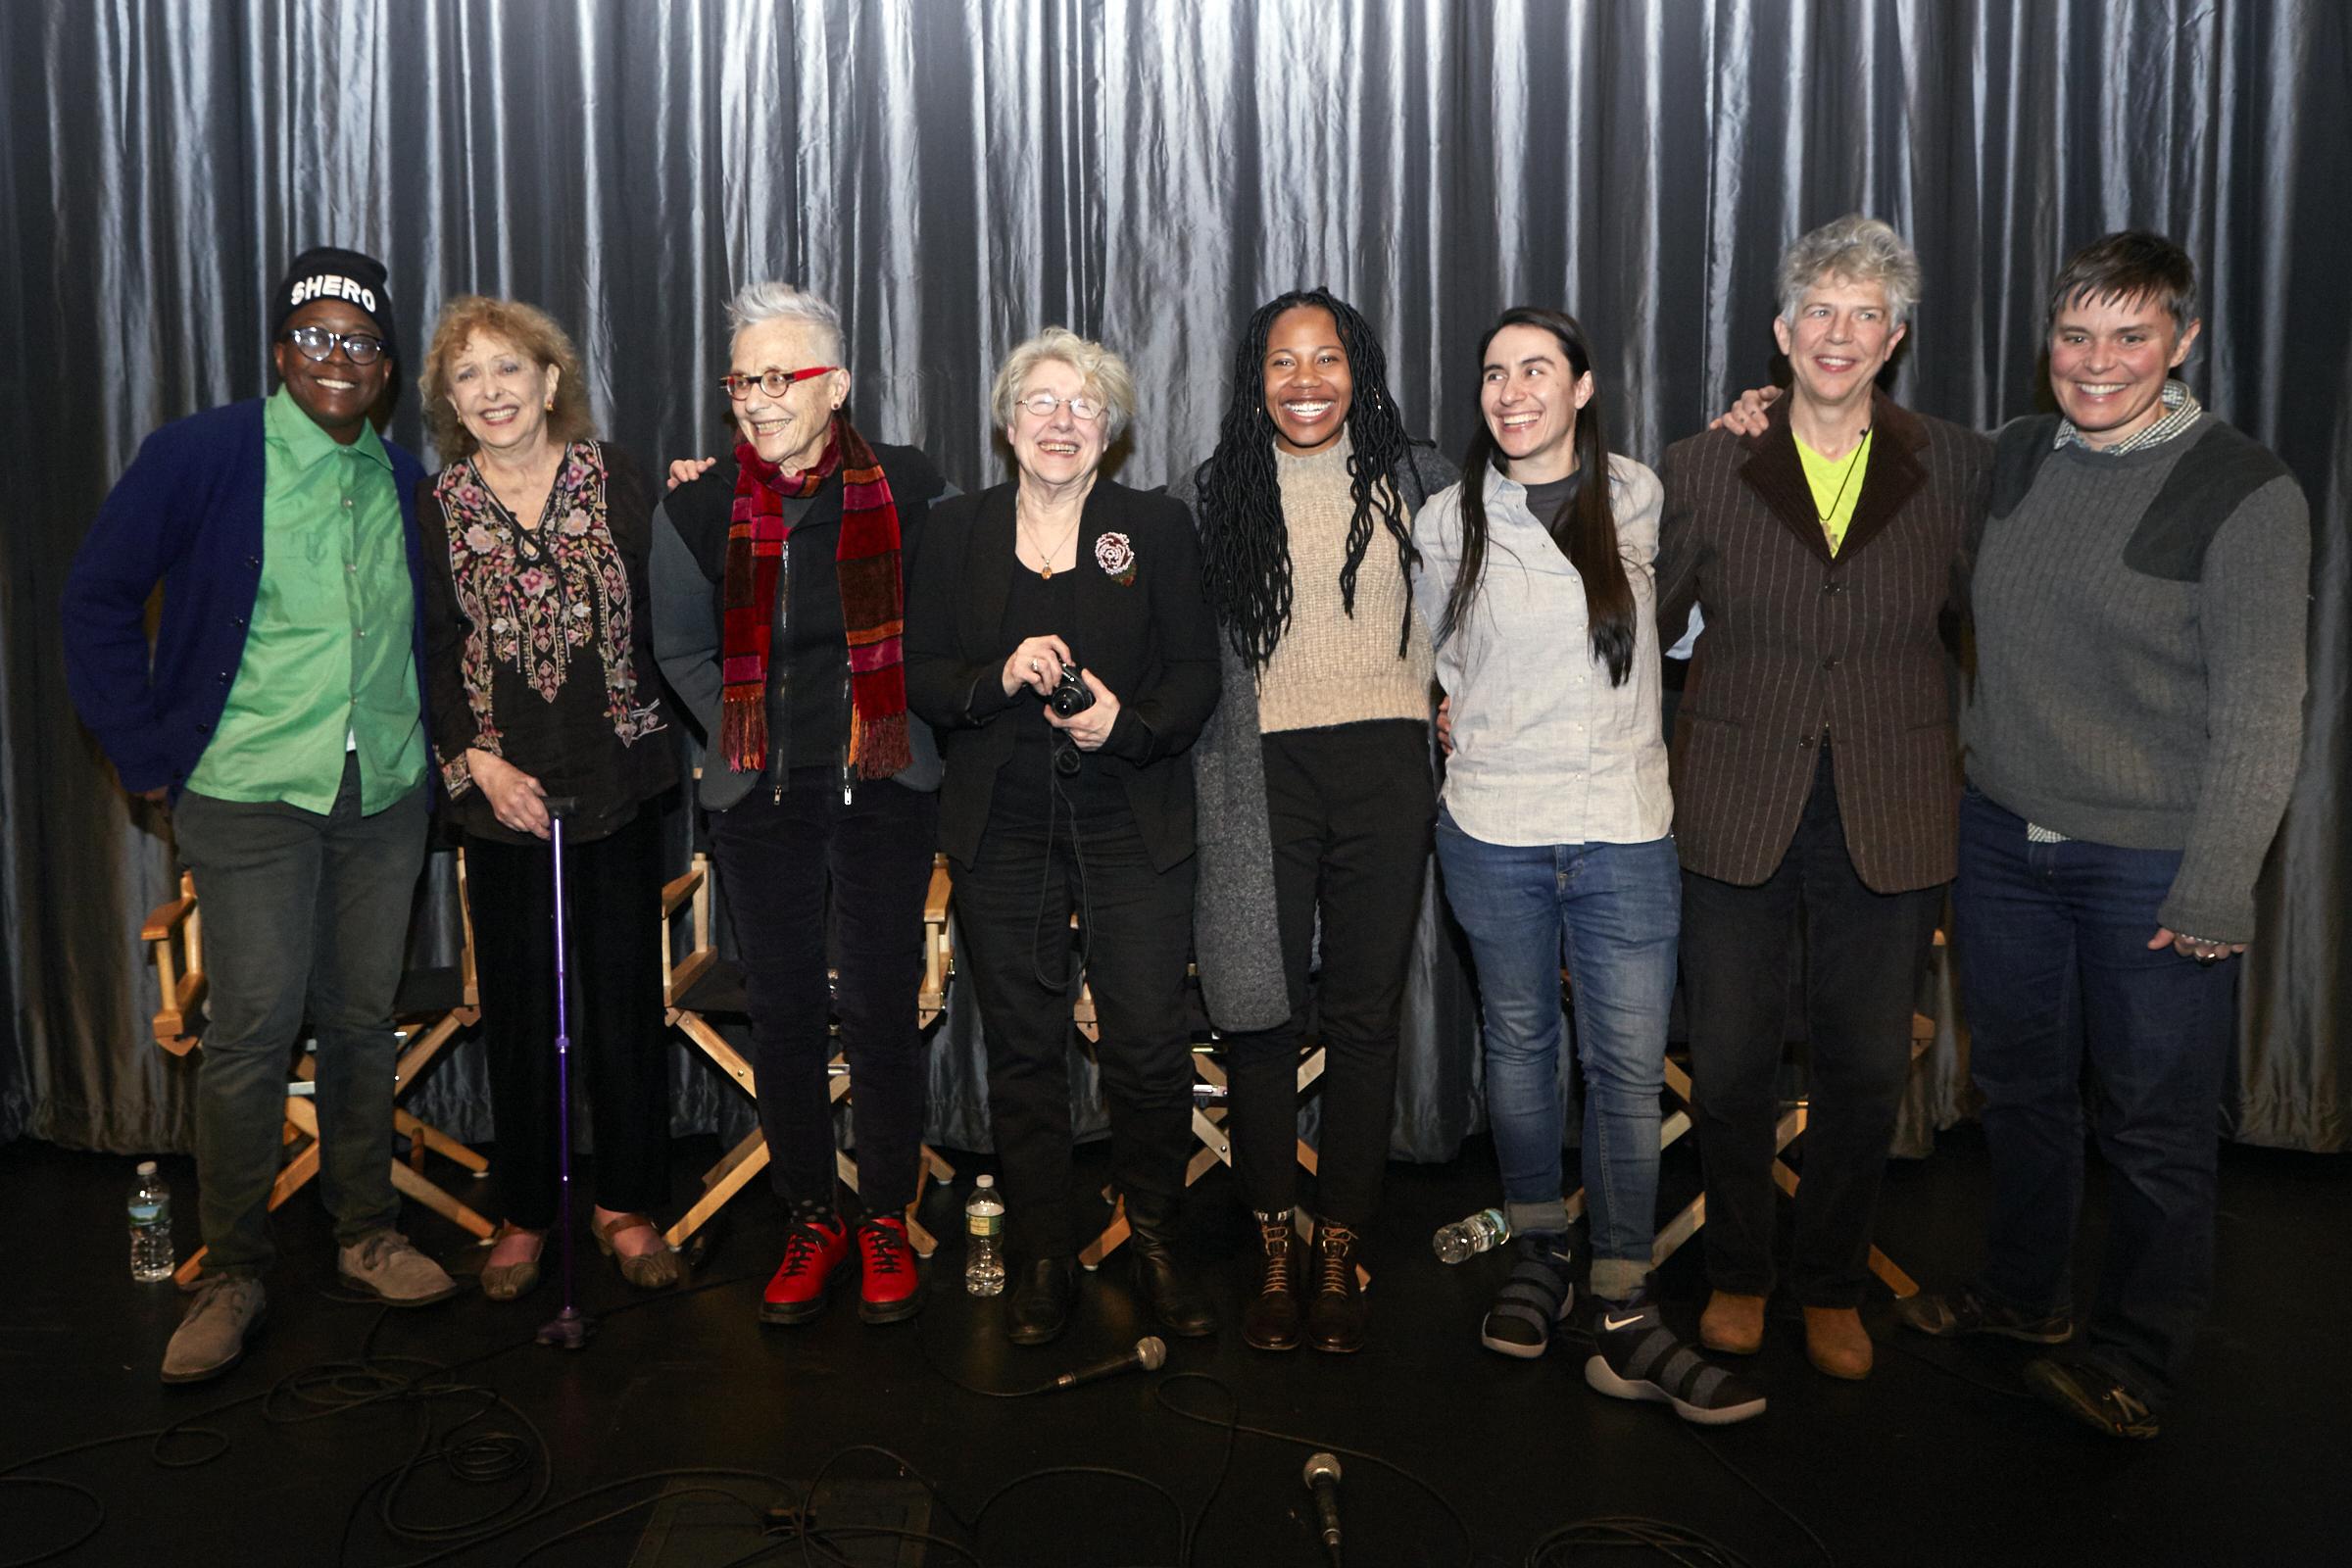 Cheryl Dunye, Carolee Scheenmann, Barbara Hammer, Martha Rosler, Fair Brane, Vanessa Haroutunian, Su Friedrich, and Dani Restack (Photo by Eric McNatt)